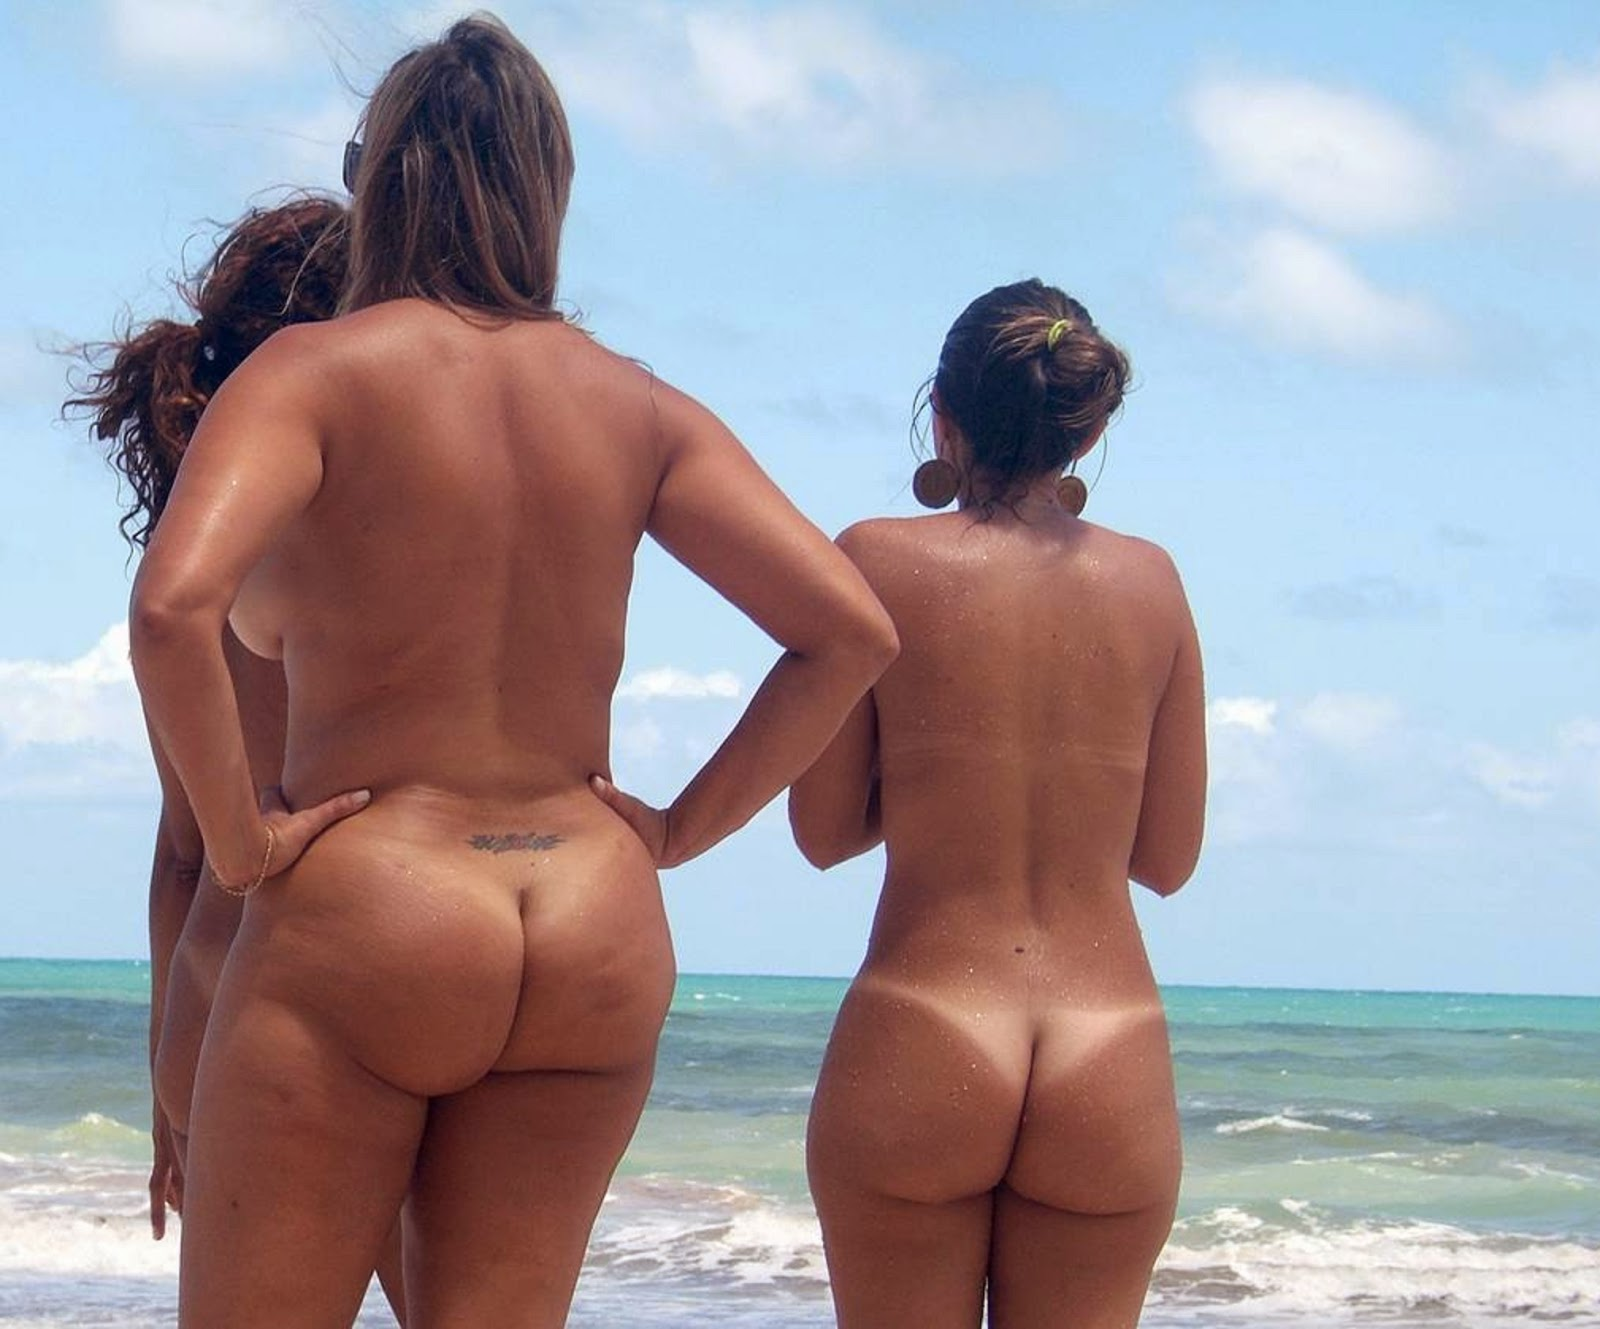 big-butts-nudety-webcam-vid-yahoo-girls